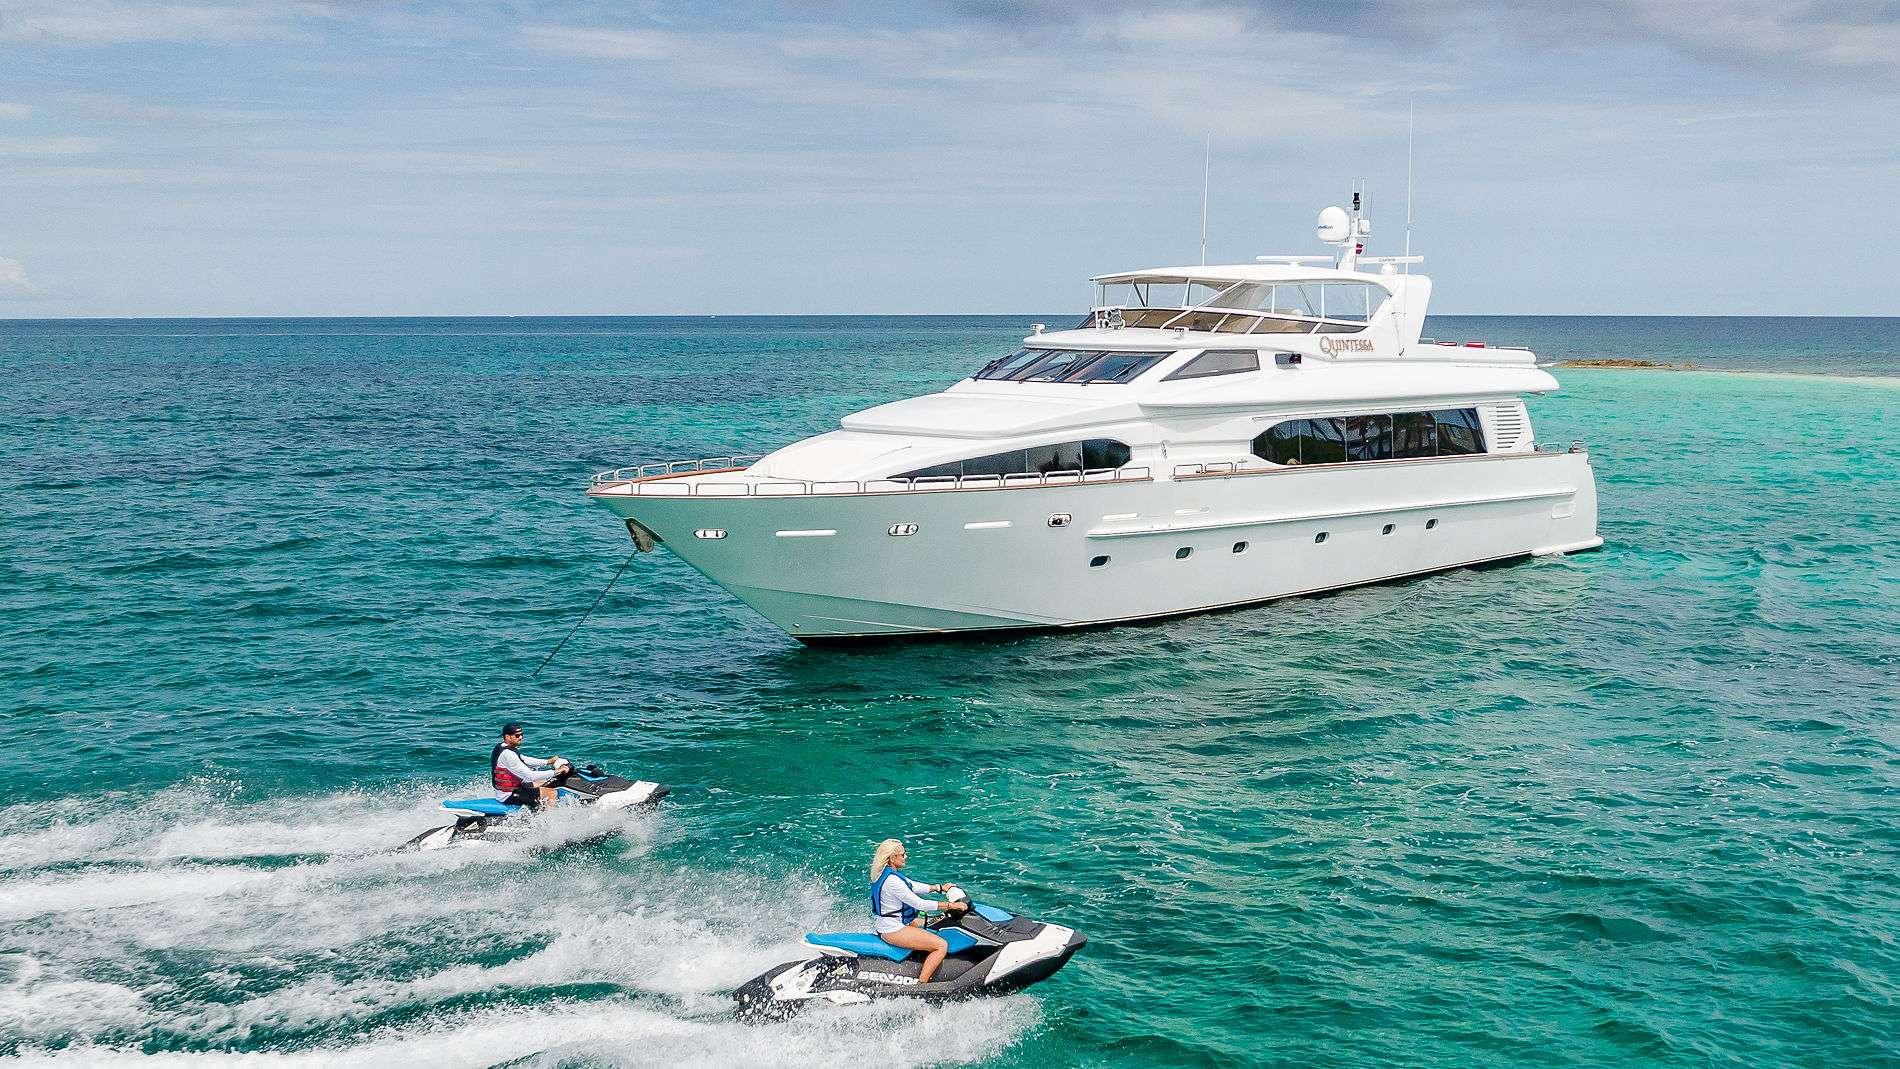 Motor Yacht 'QUINTESSA', 8 PAX, 4 Crew, 94.00 Ft, 28.00 Meters, Built 2000, Destiny, Refit Year 2019